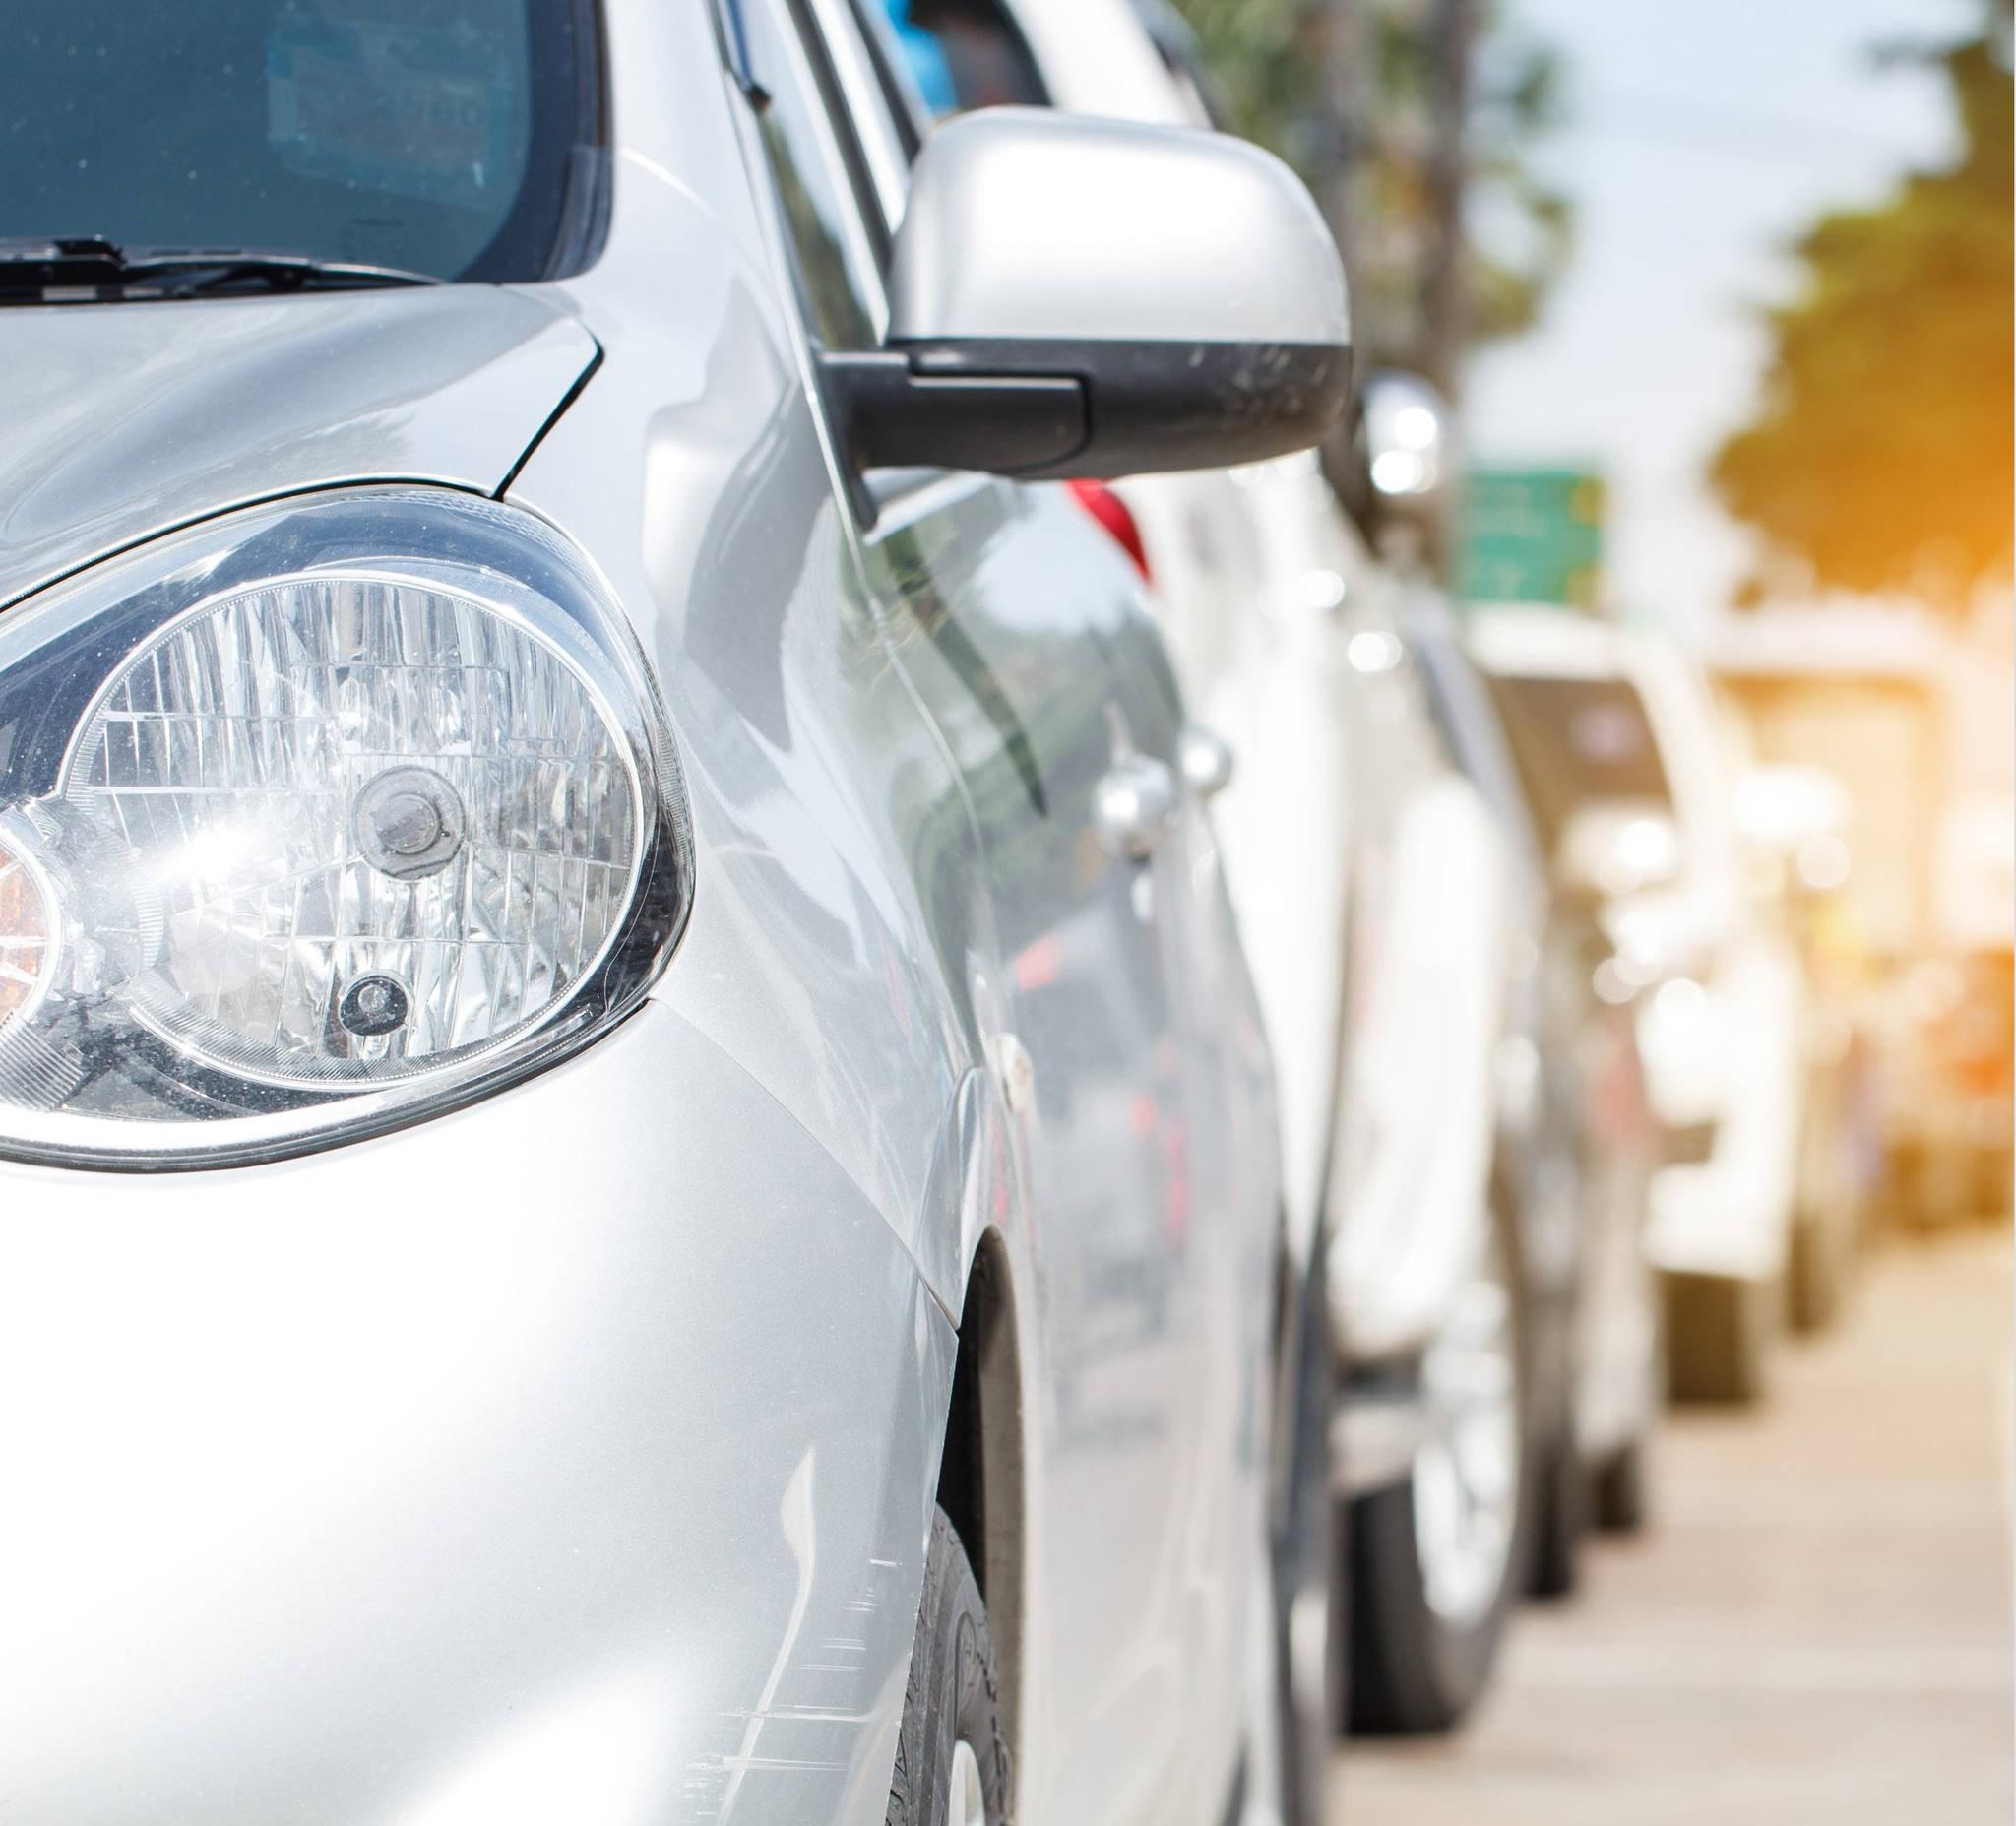 Gov\'t Won\'t Pursue Talking Car Mandate | Scribd